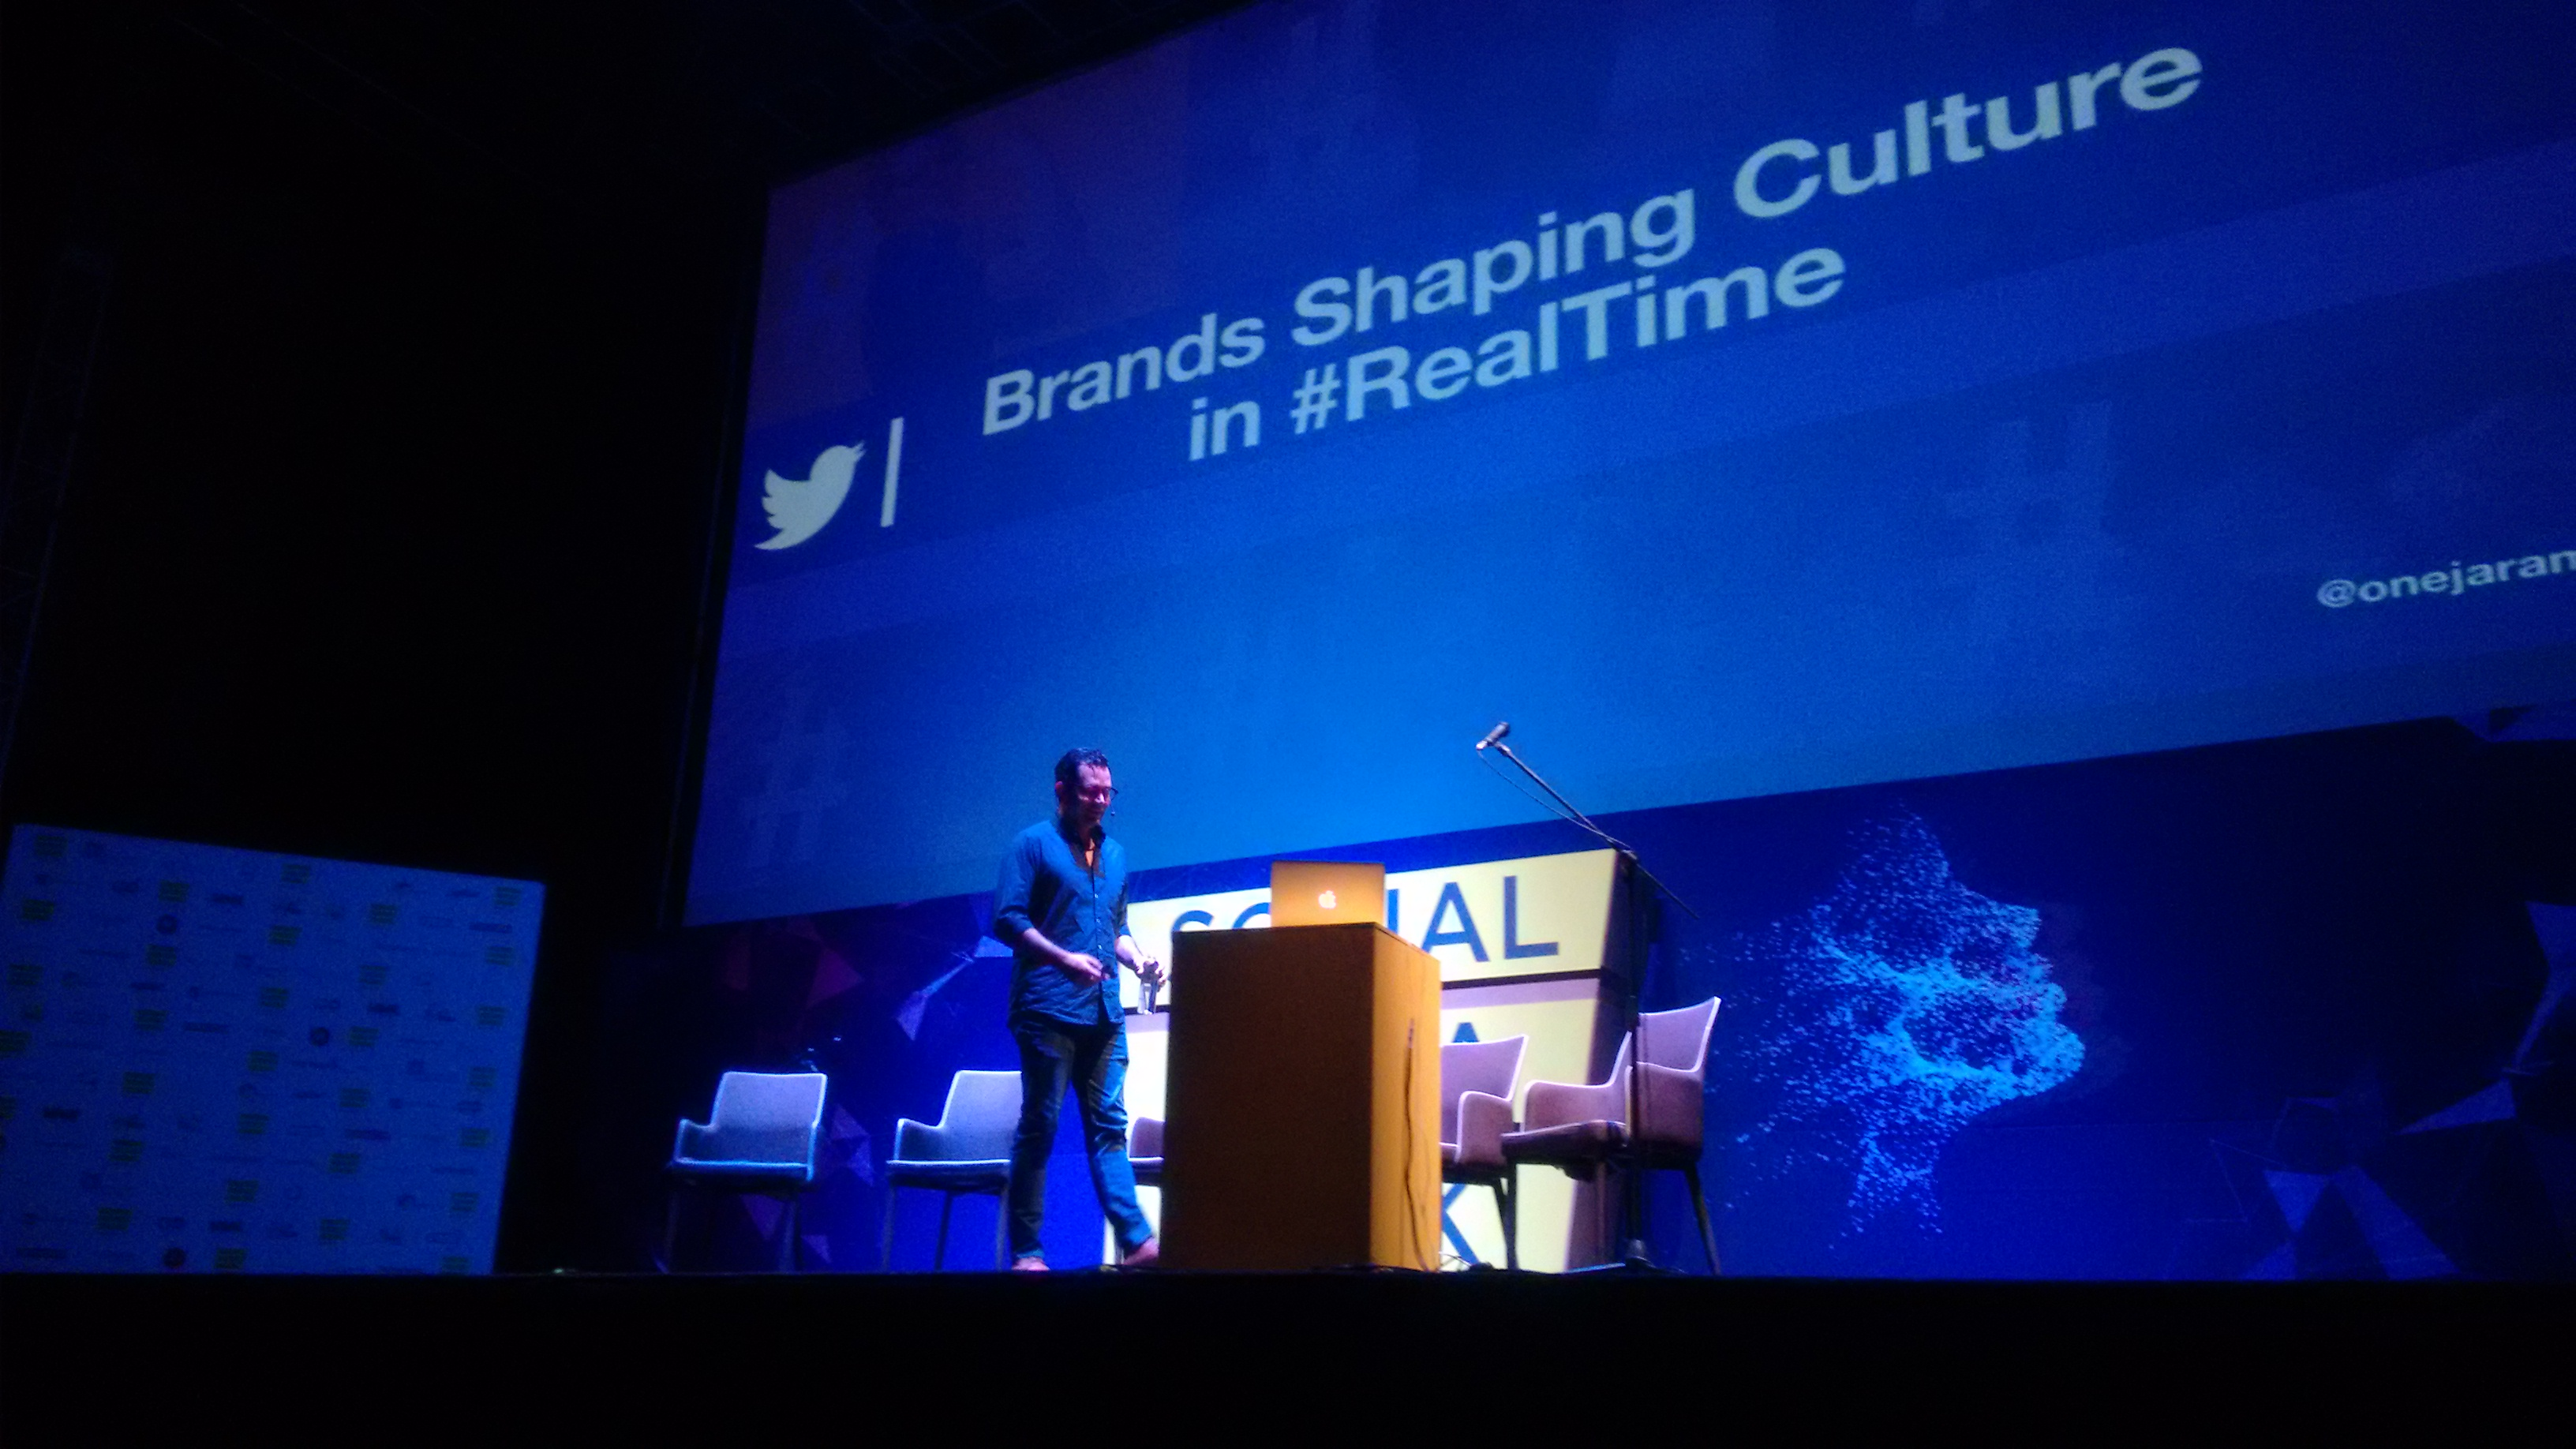 Martín Jaramillo de Twitter, presenta el tema Relevant brands shape culture